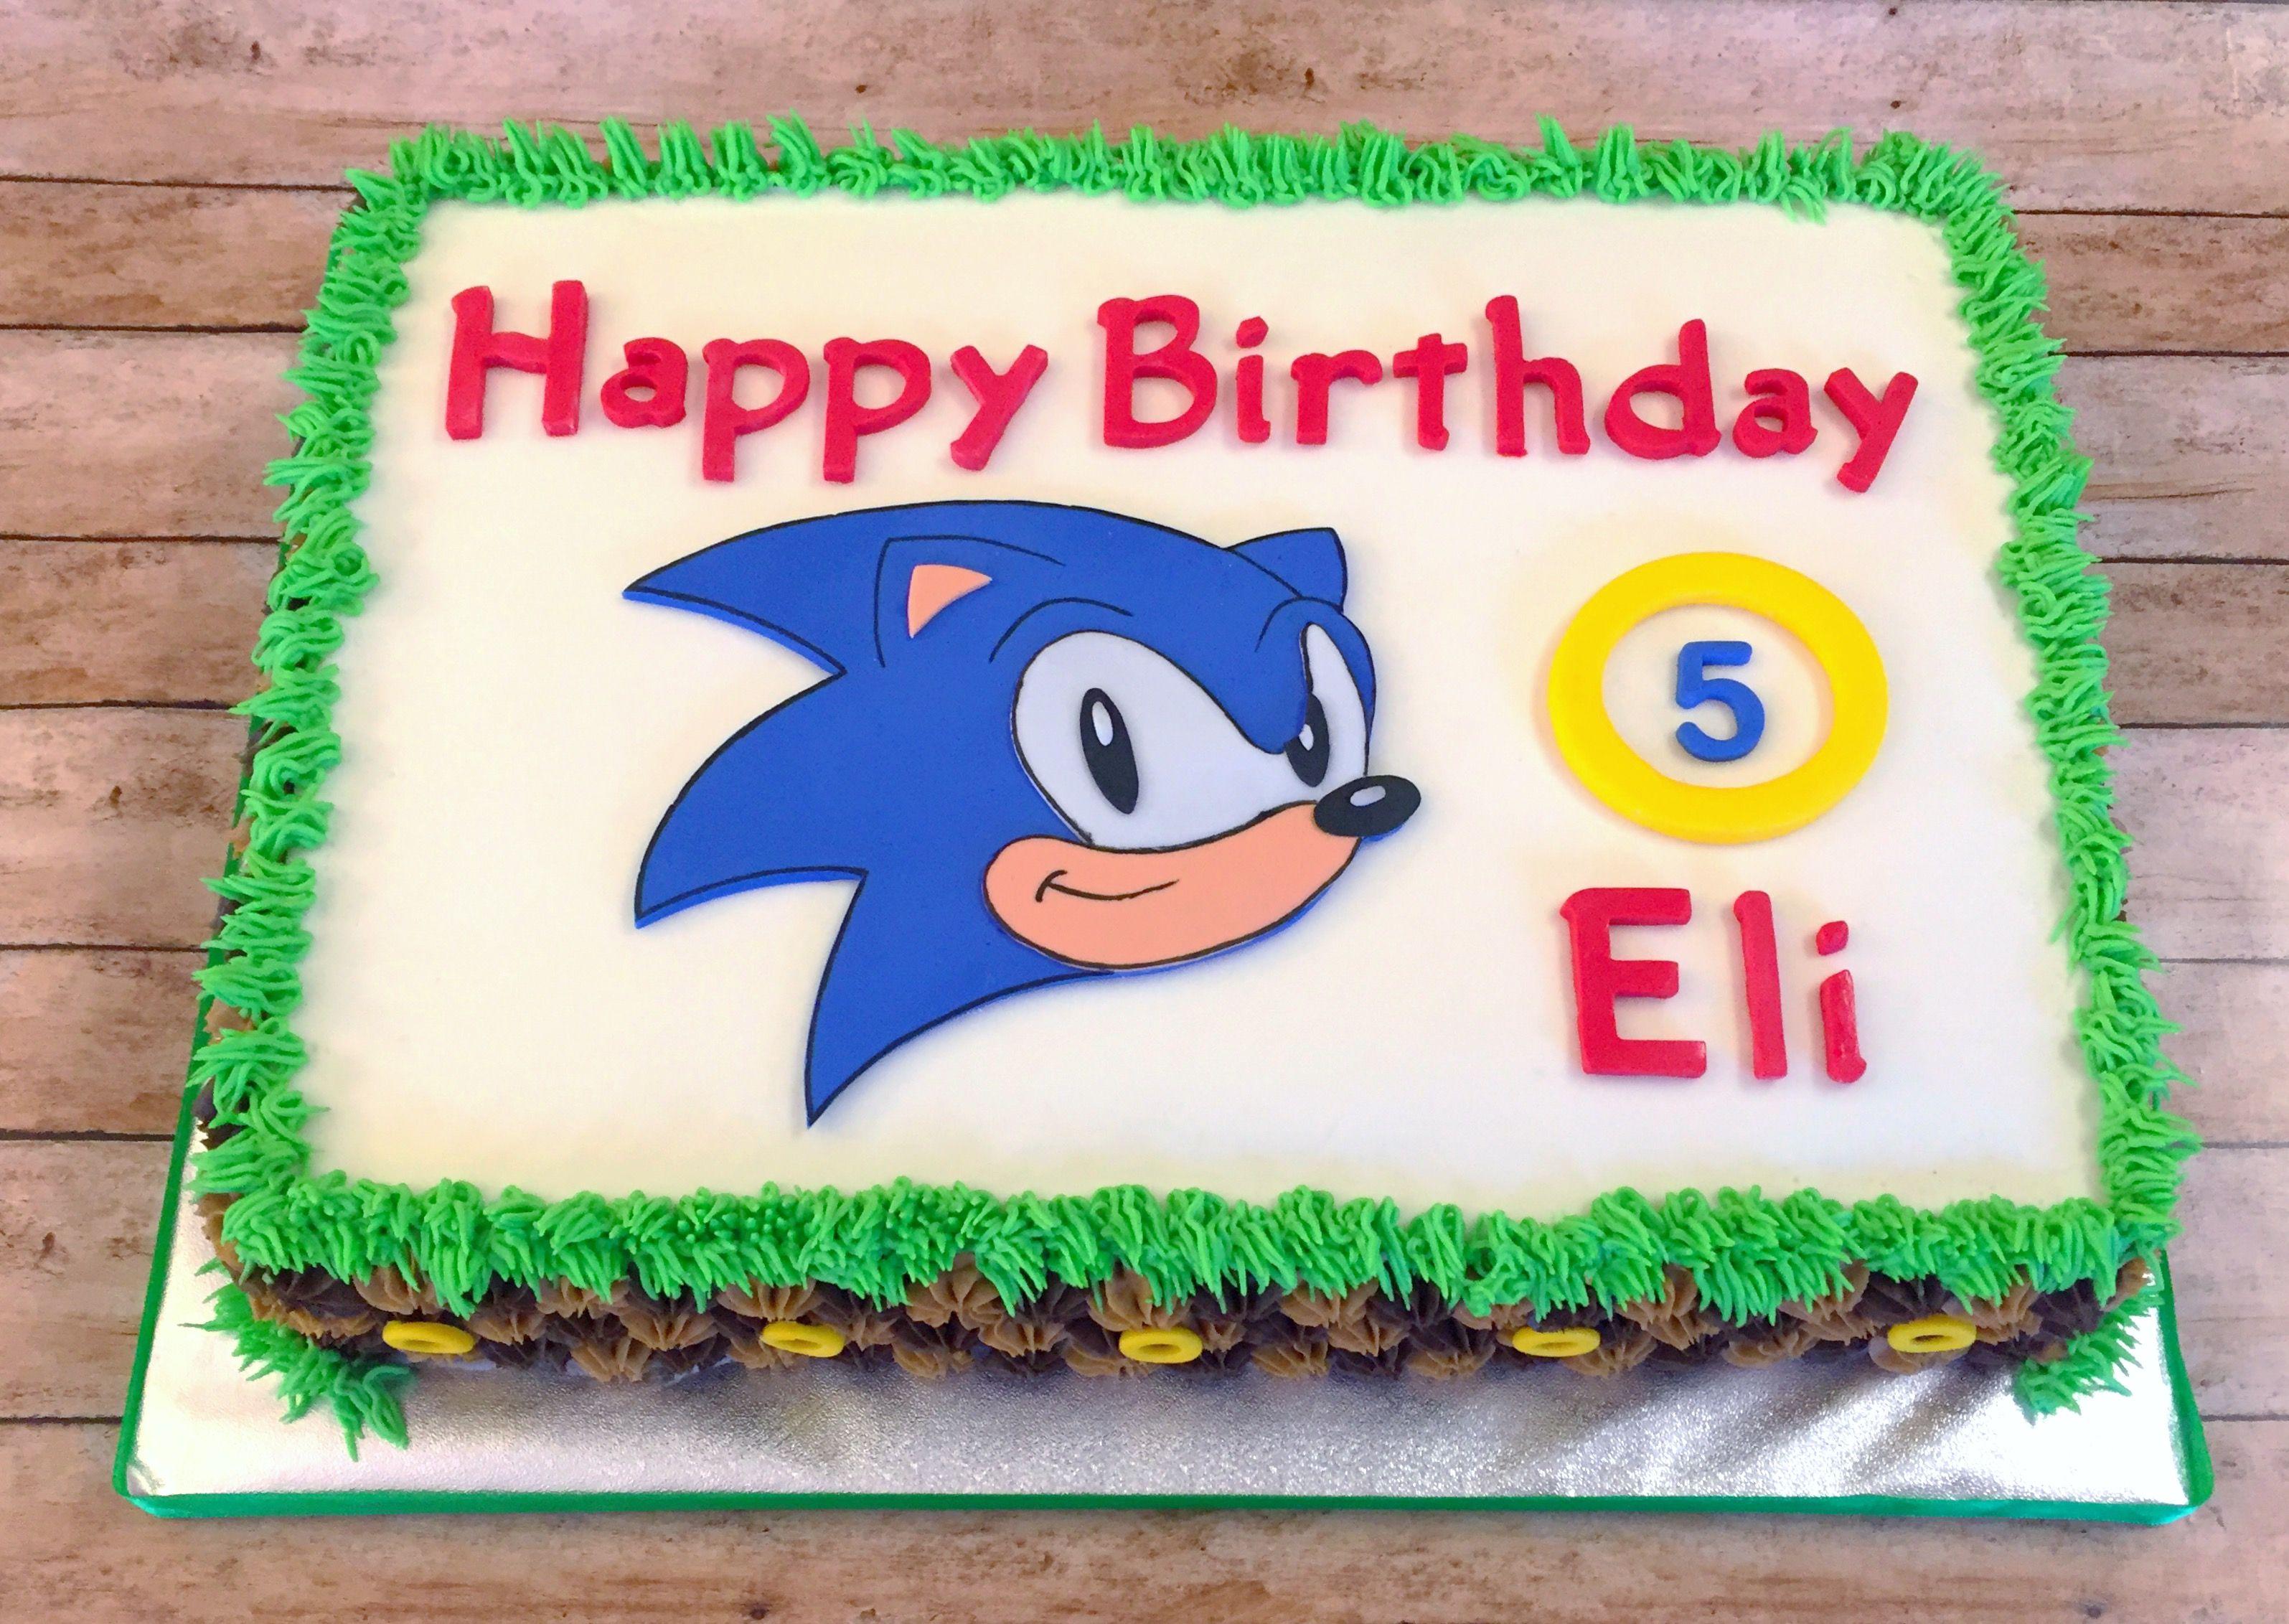 Sonic The Hedgehog Cake Sonic The Hedgehog Cake Birthday Cake Kids Hedgehog Cake